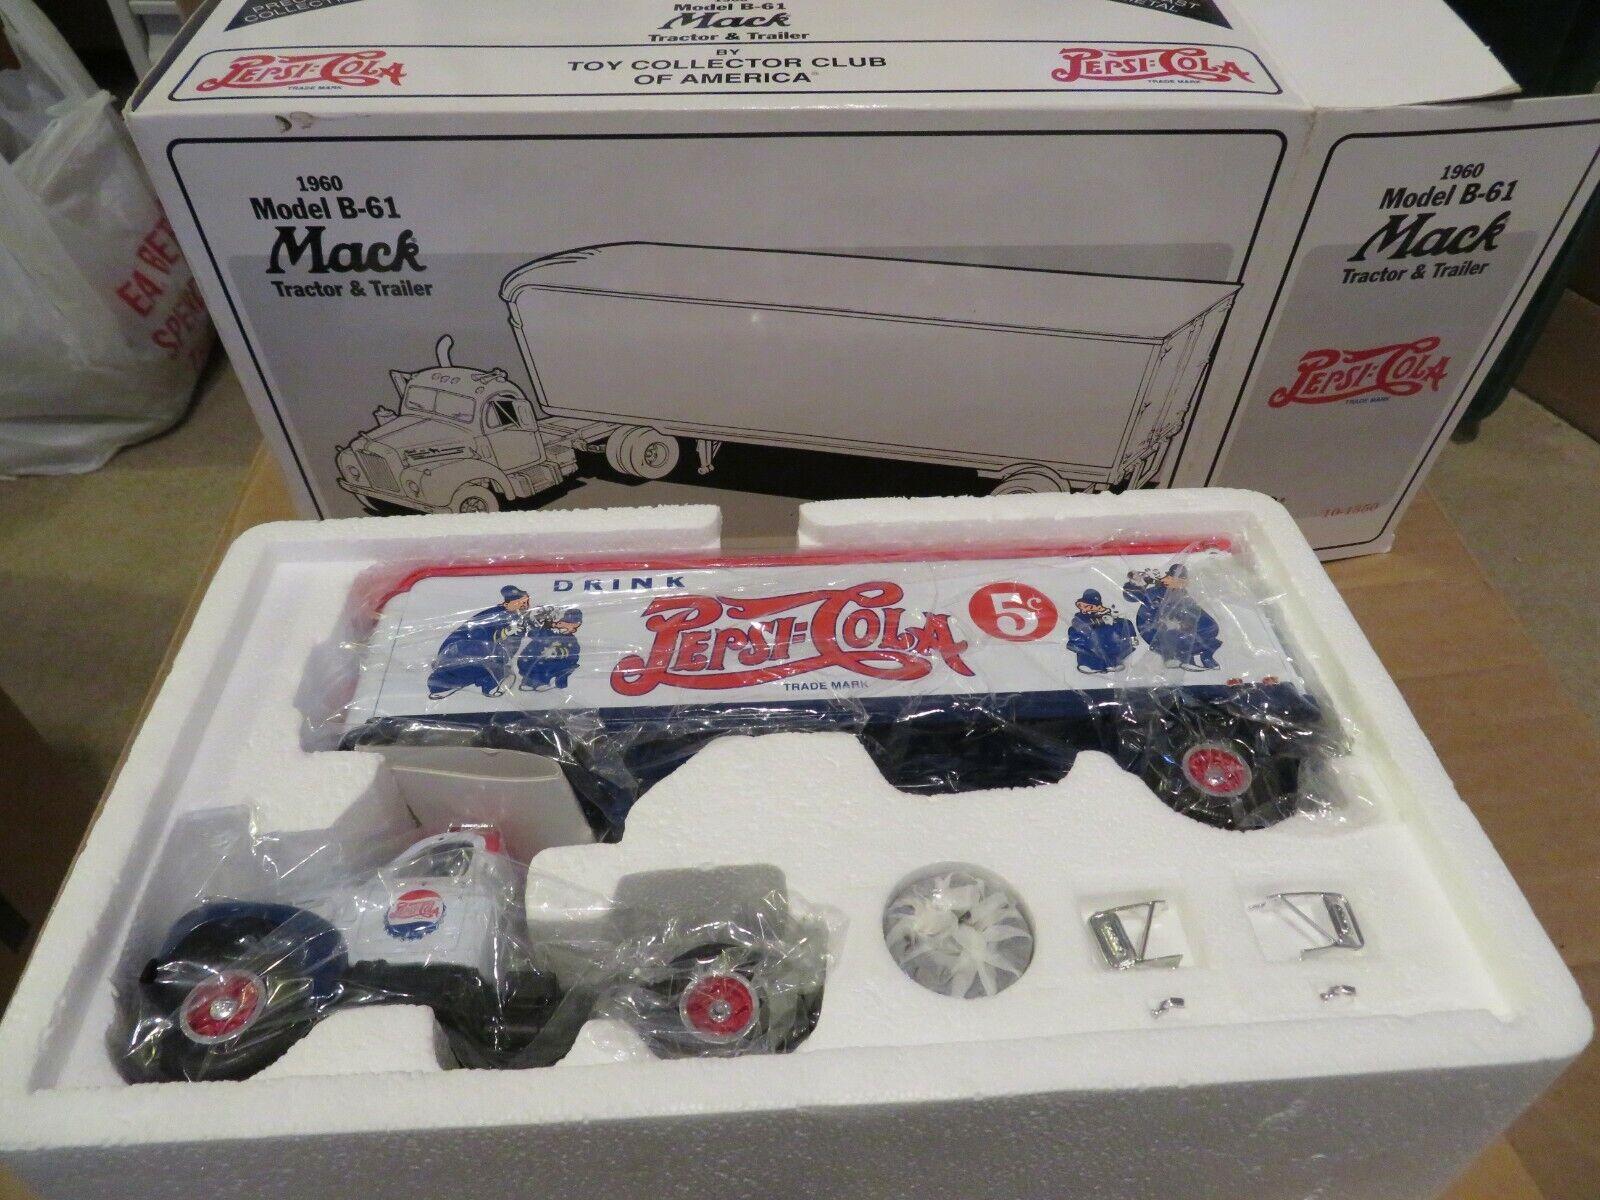 First 1st Gear 1960 Model B-61 Tractor&Trailer Pepsi-Cola 1 34 Scale 1995 MIB